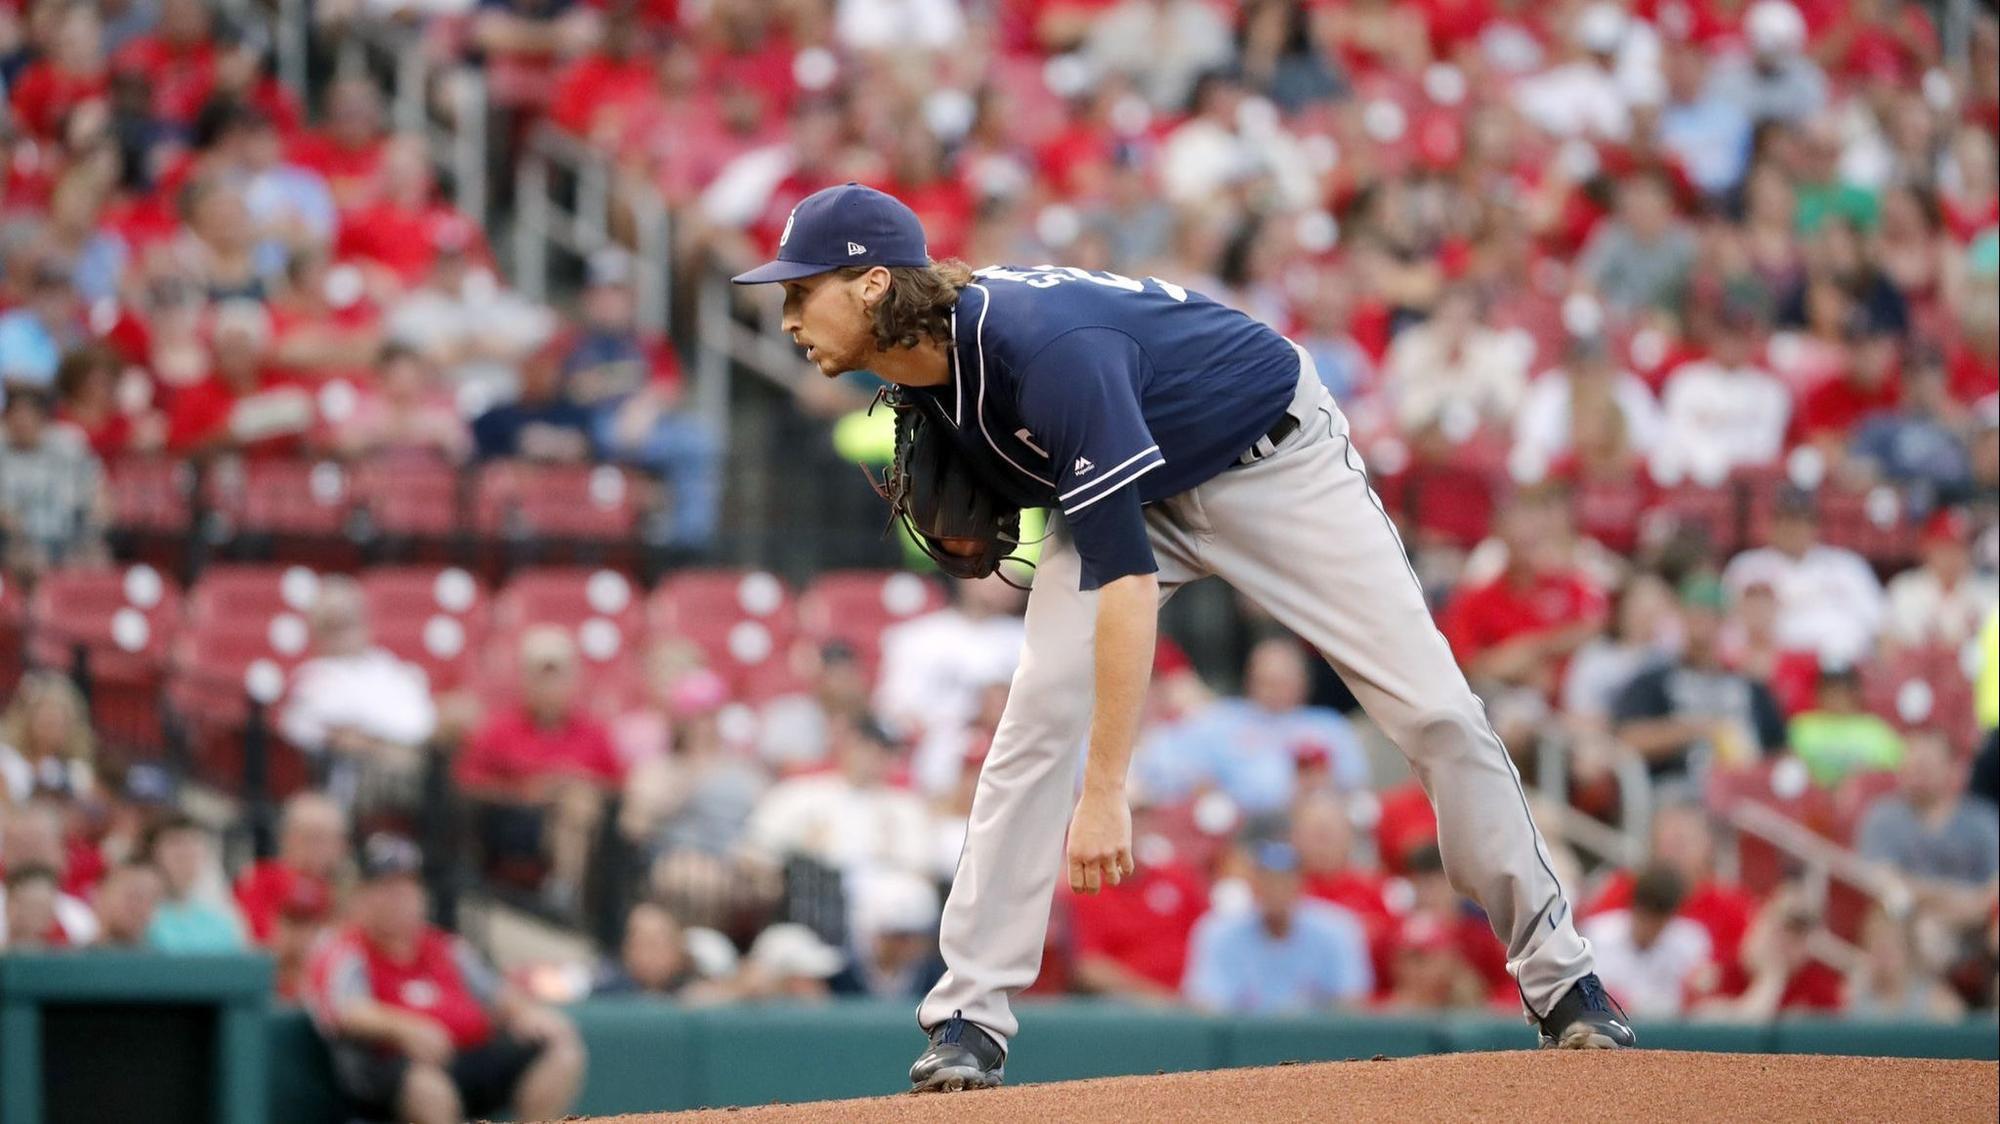 Padres bullpen beats Cardinals to even series